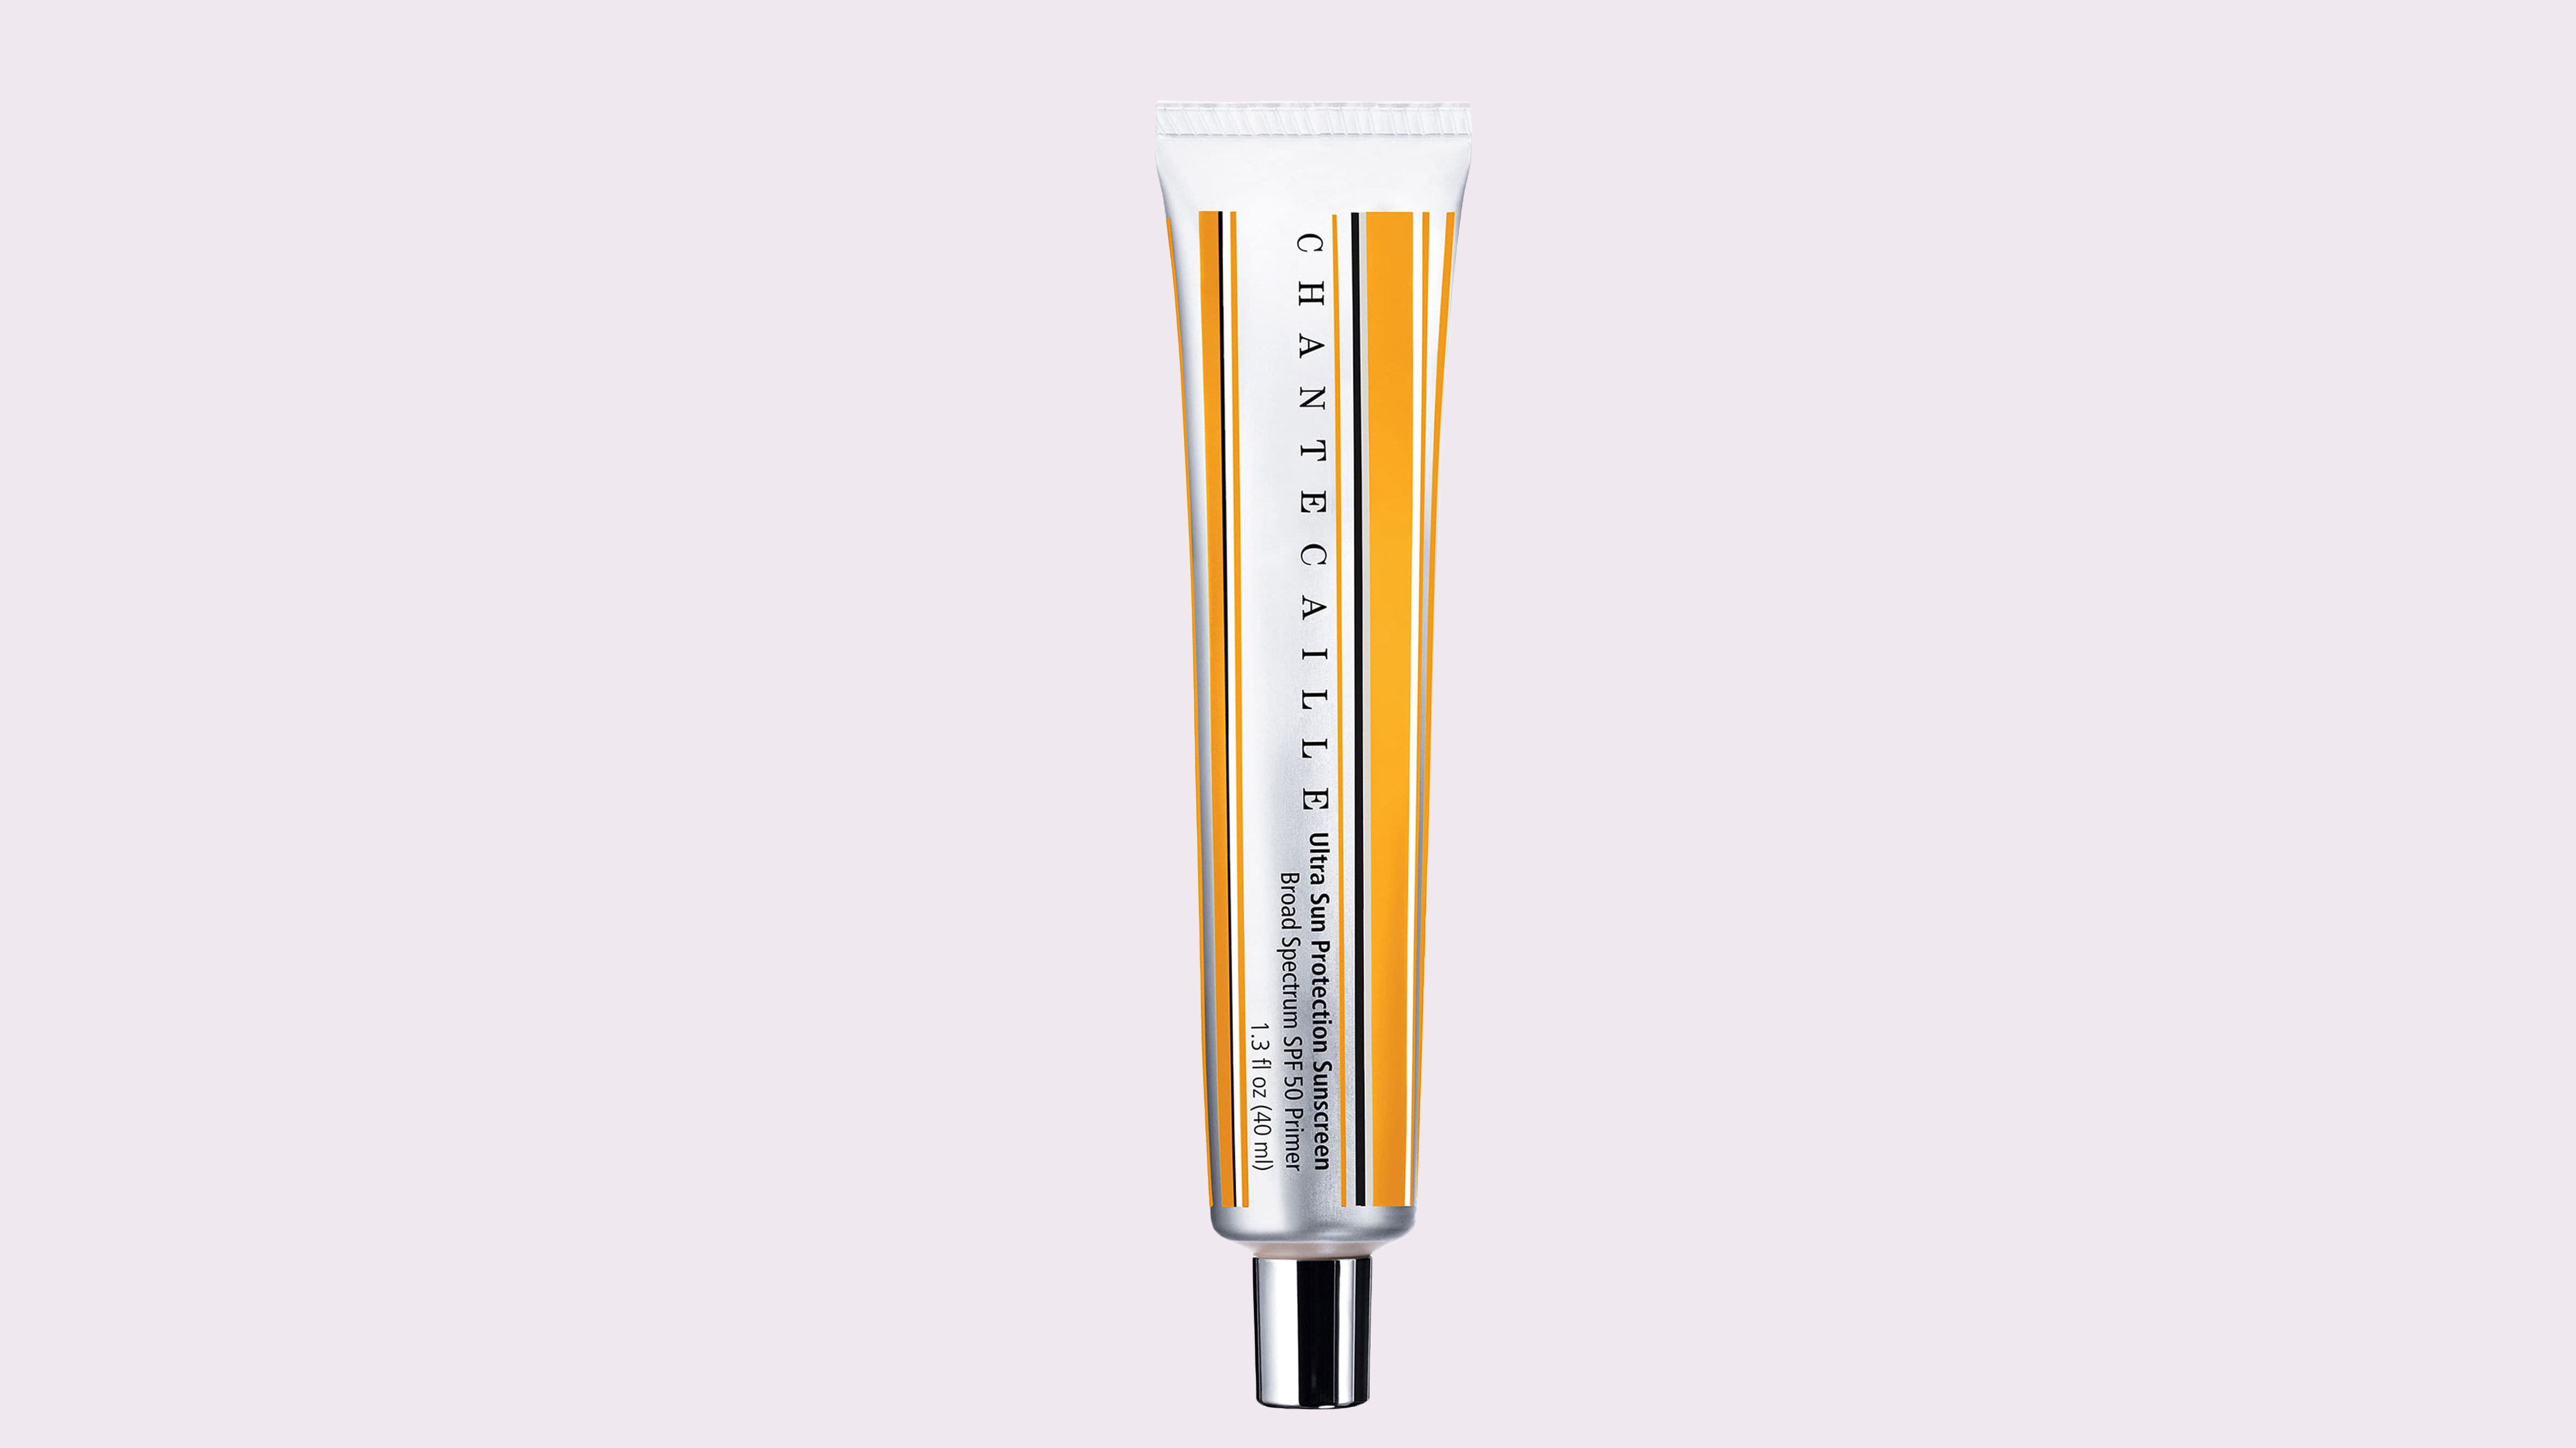 Chantecaille Ultra Sun Broad Spectrum Primer SPF 45 Primer